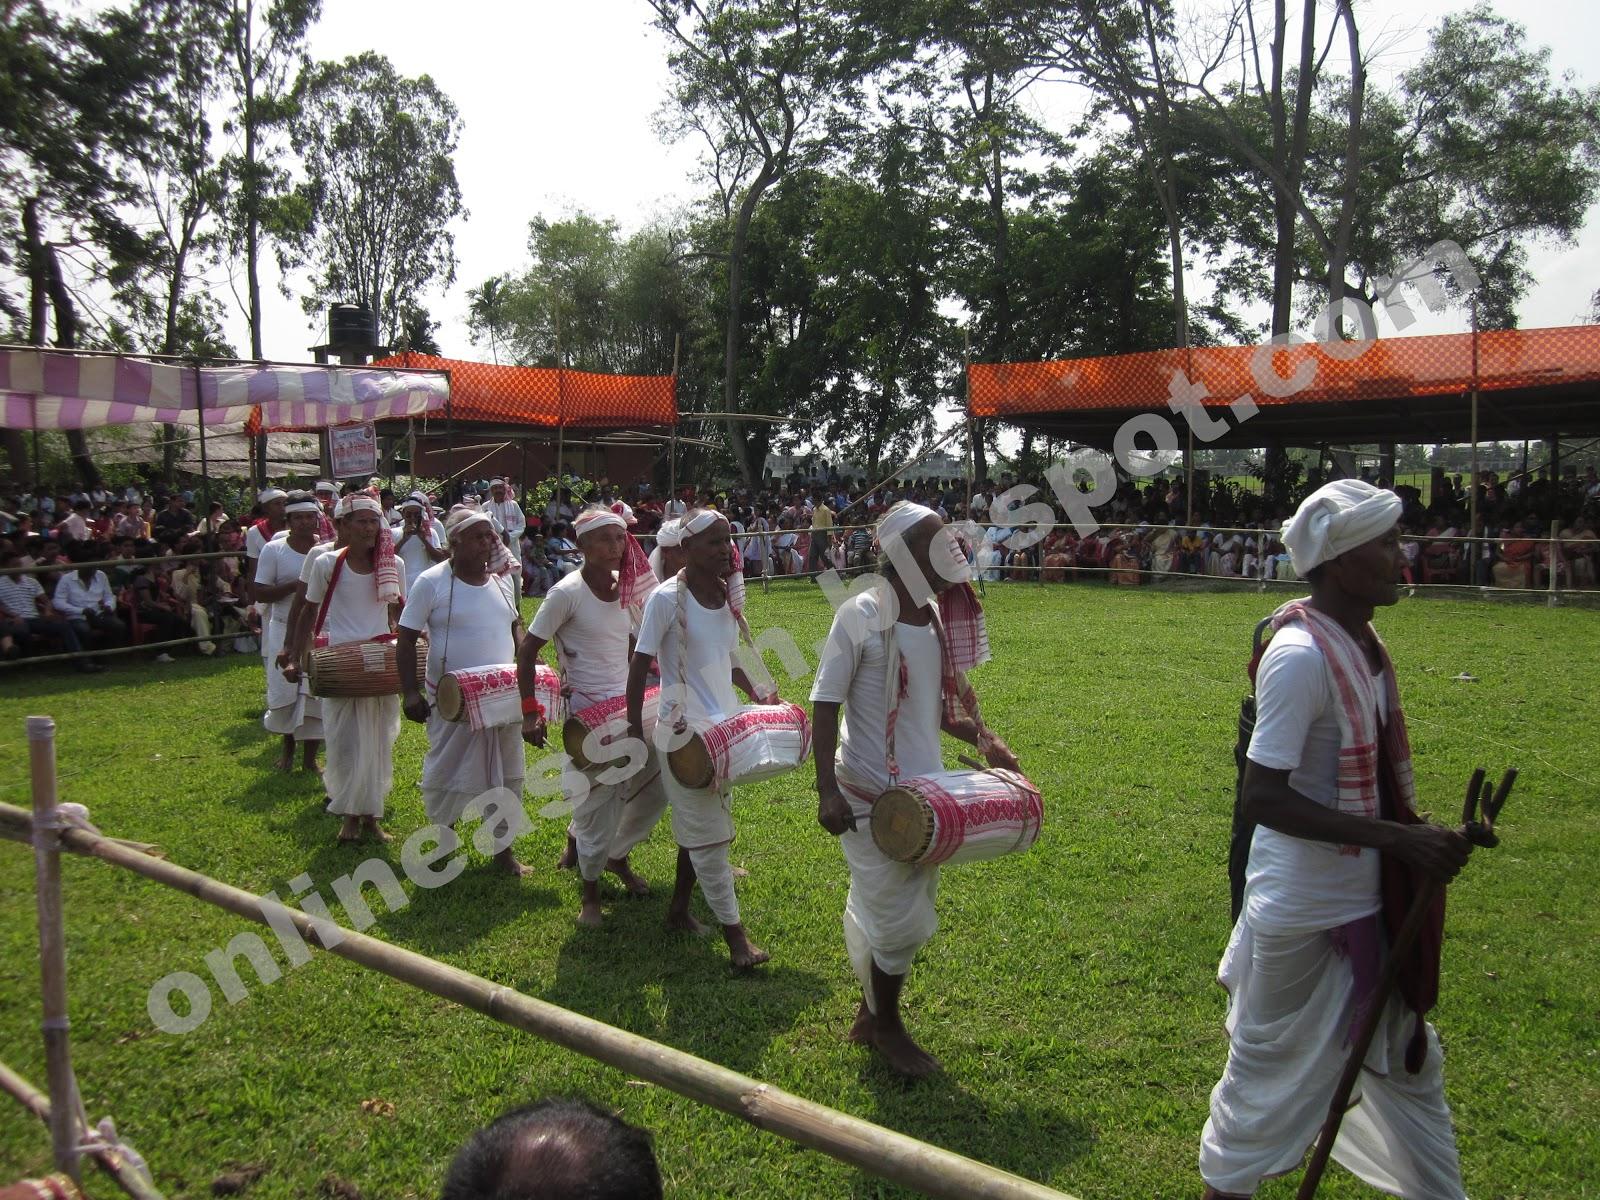 rongali bihu essay The bihu is the national festival of assam bihu is celebratd three times in a year in assam celebrates three types of bihu name as, rongaali bihu, kati bihu and.